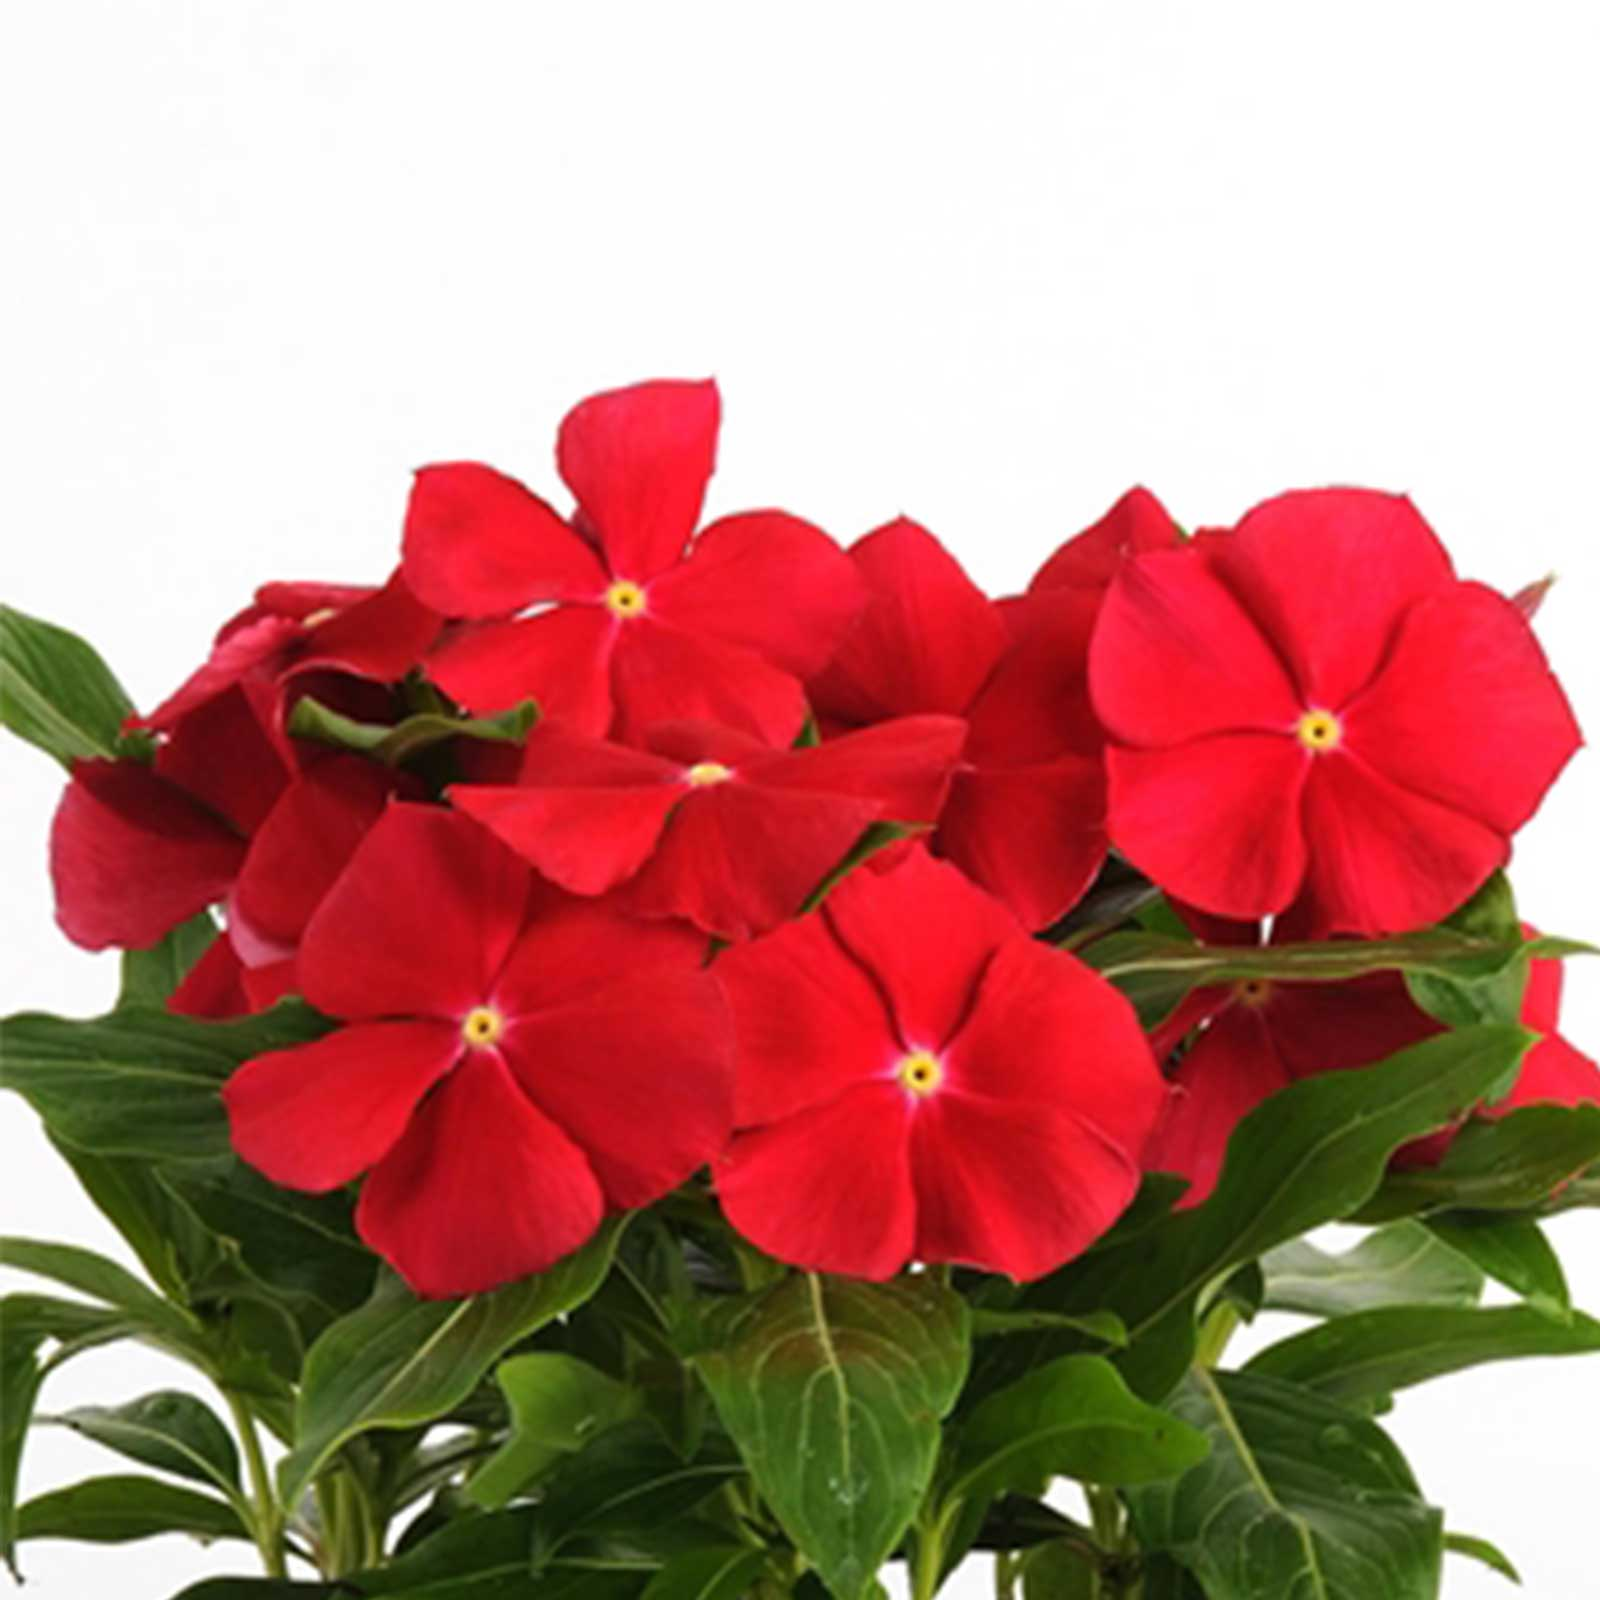 Vinca Flower Garden Seeds - Pacifica XP Series - Color Mix - 1000 Seeds - Annual Flower Gardening Seed